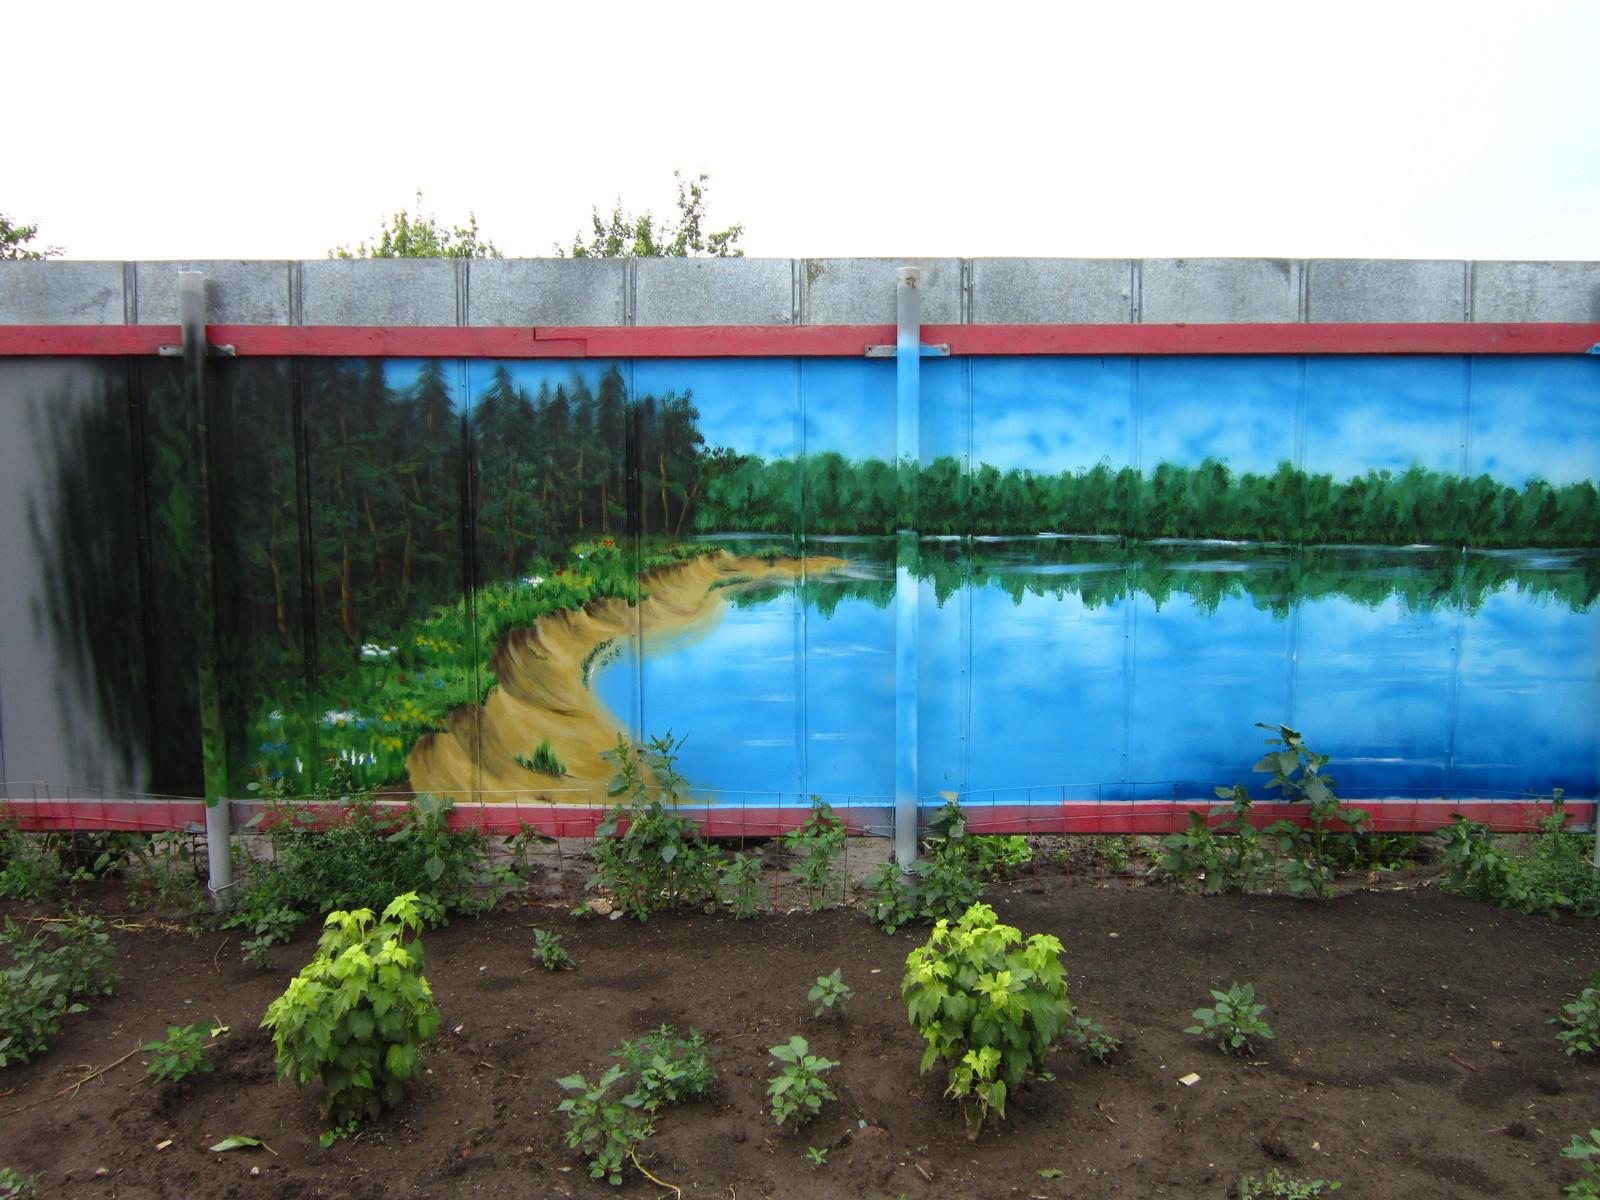 Немного лета в ленту. Рисунок на заборе на даче. | Пикабу